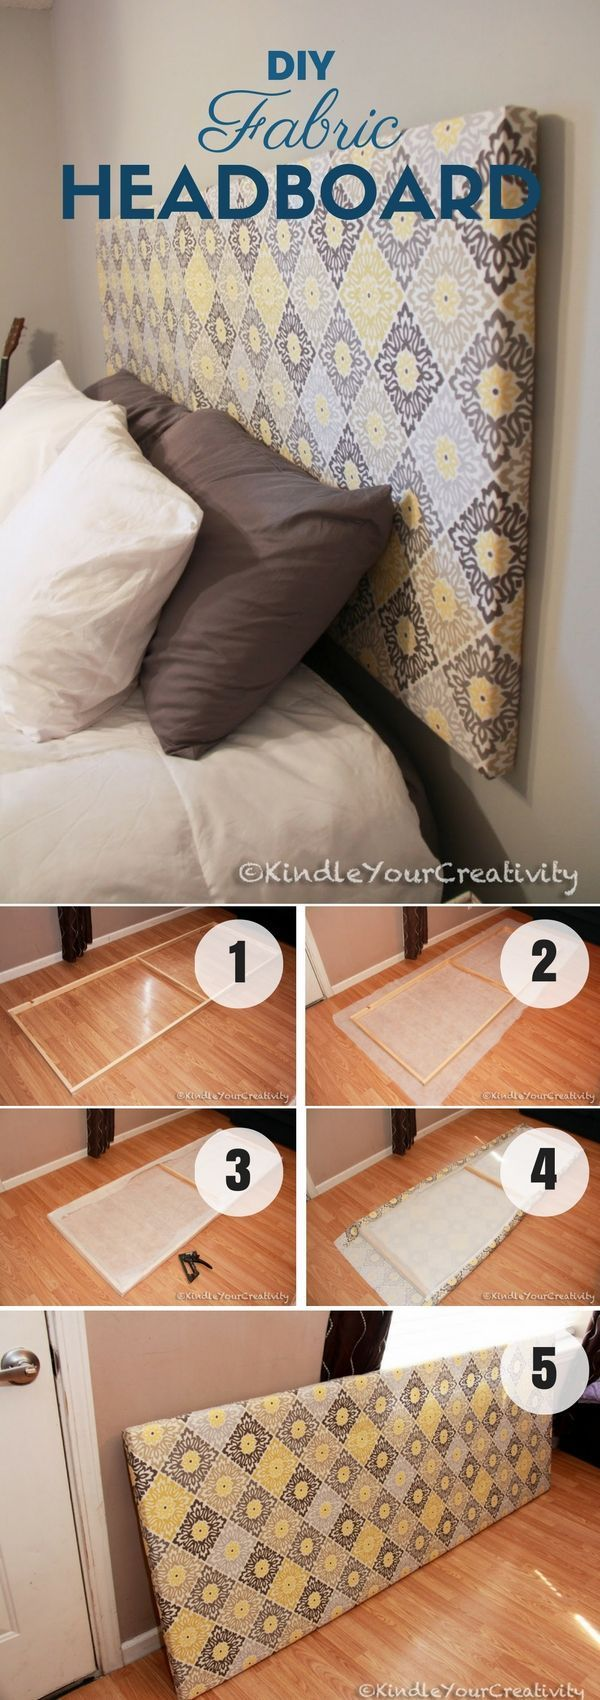 #cama #bed #pallet #palet #cabecero #diy #handmade